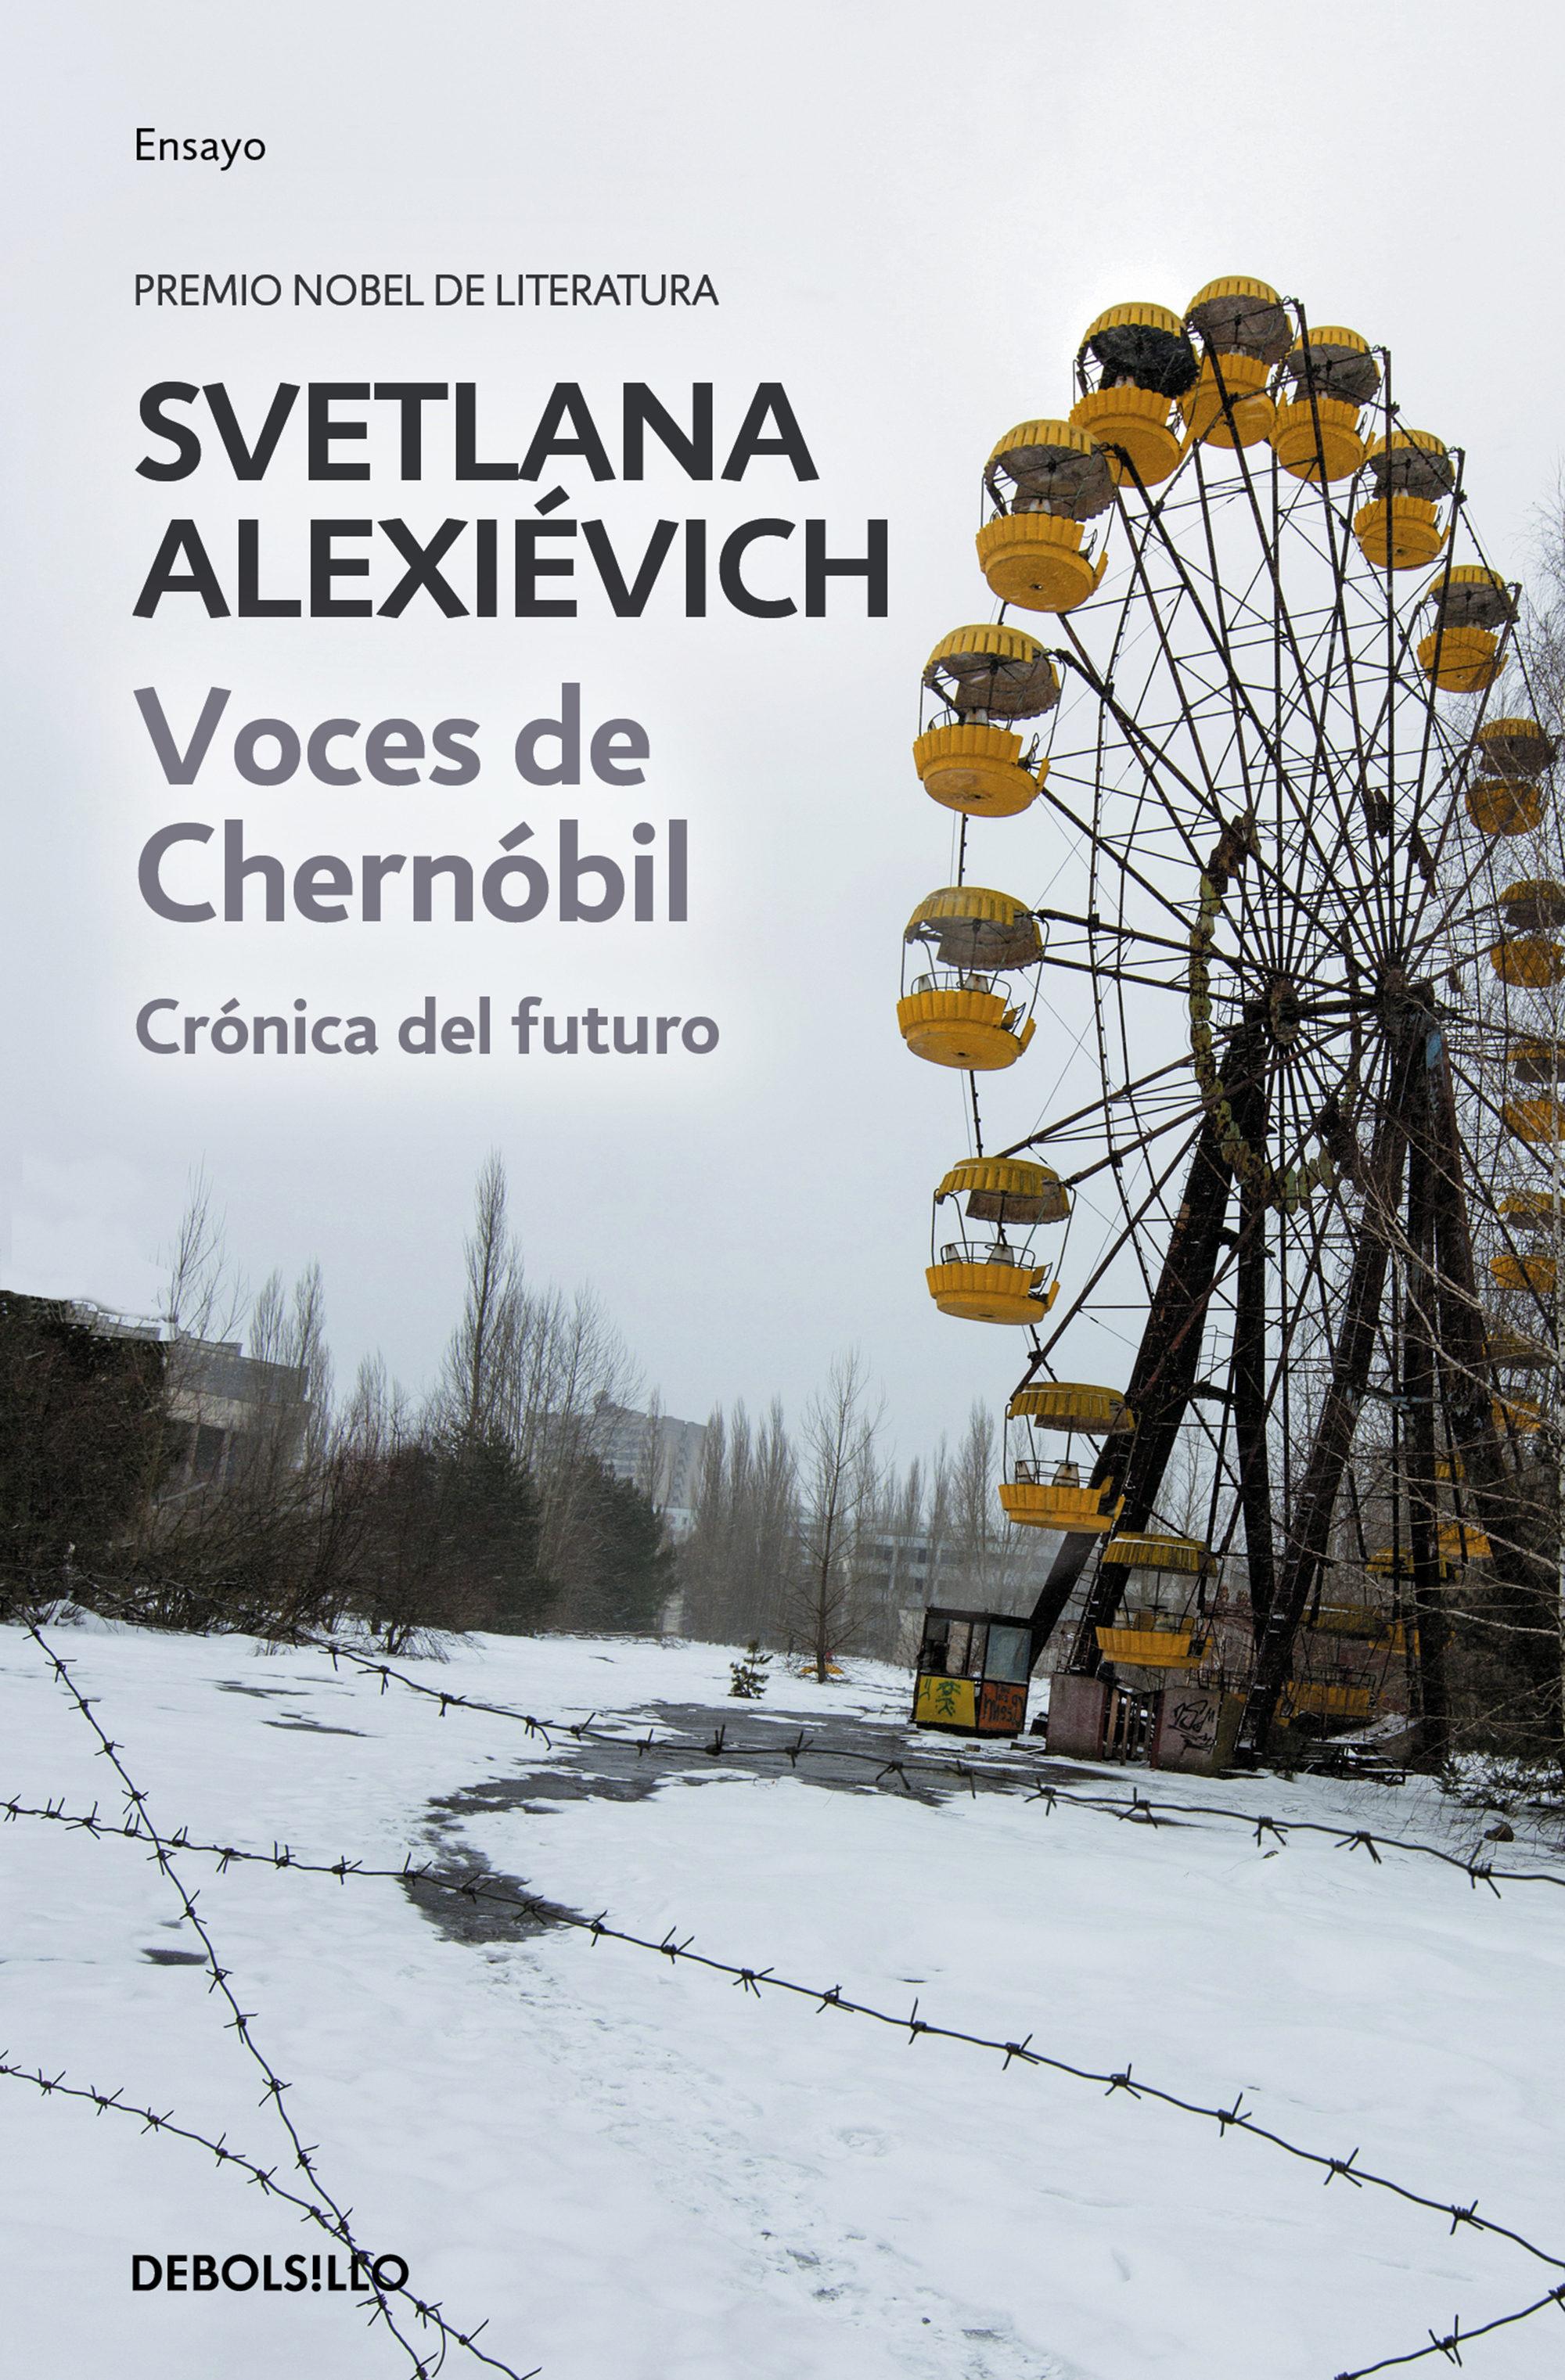 Voces de Chernóbil. Svetlana Alexiévich